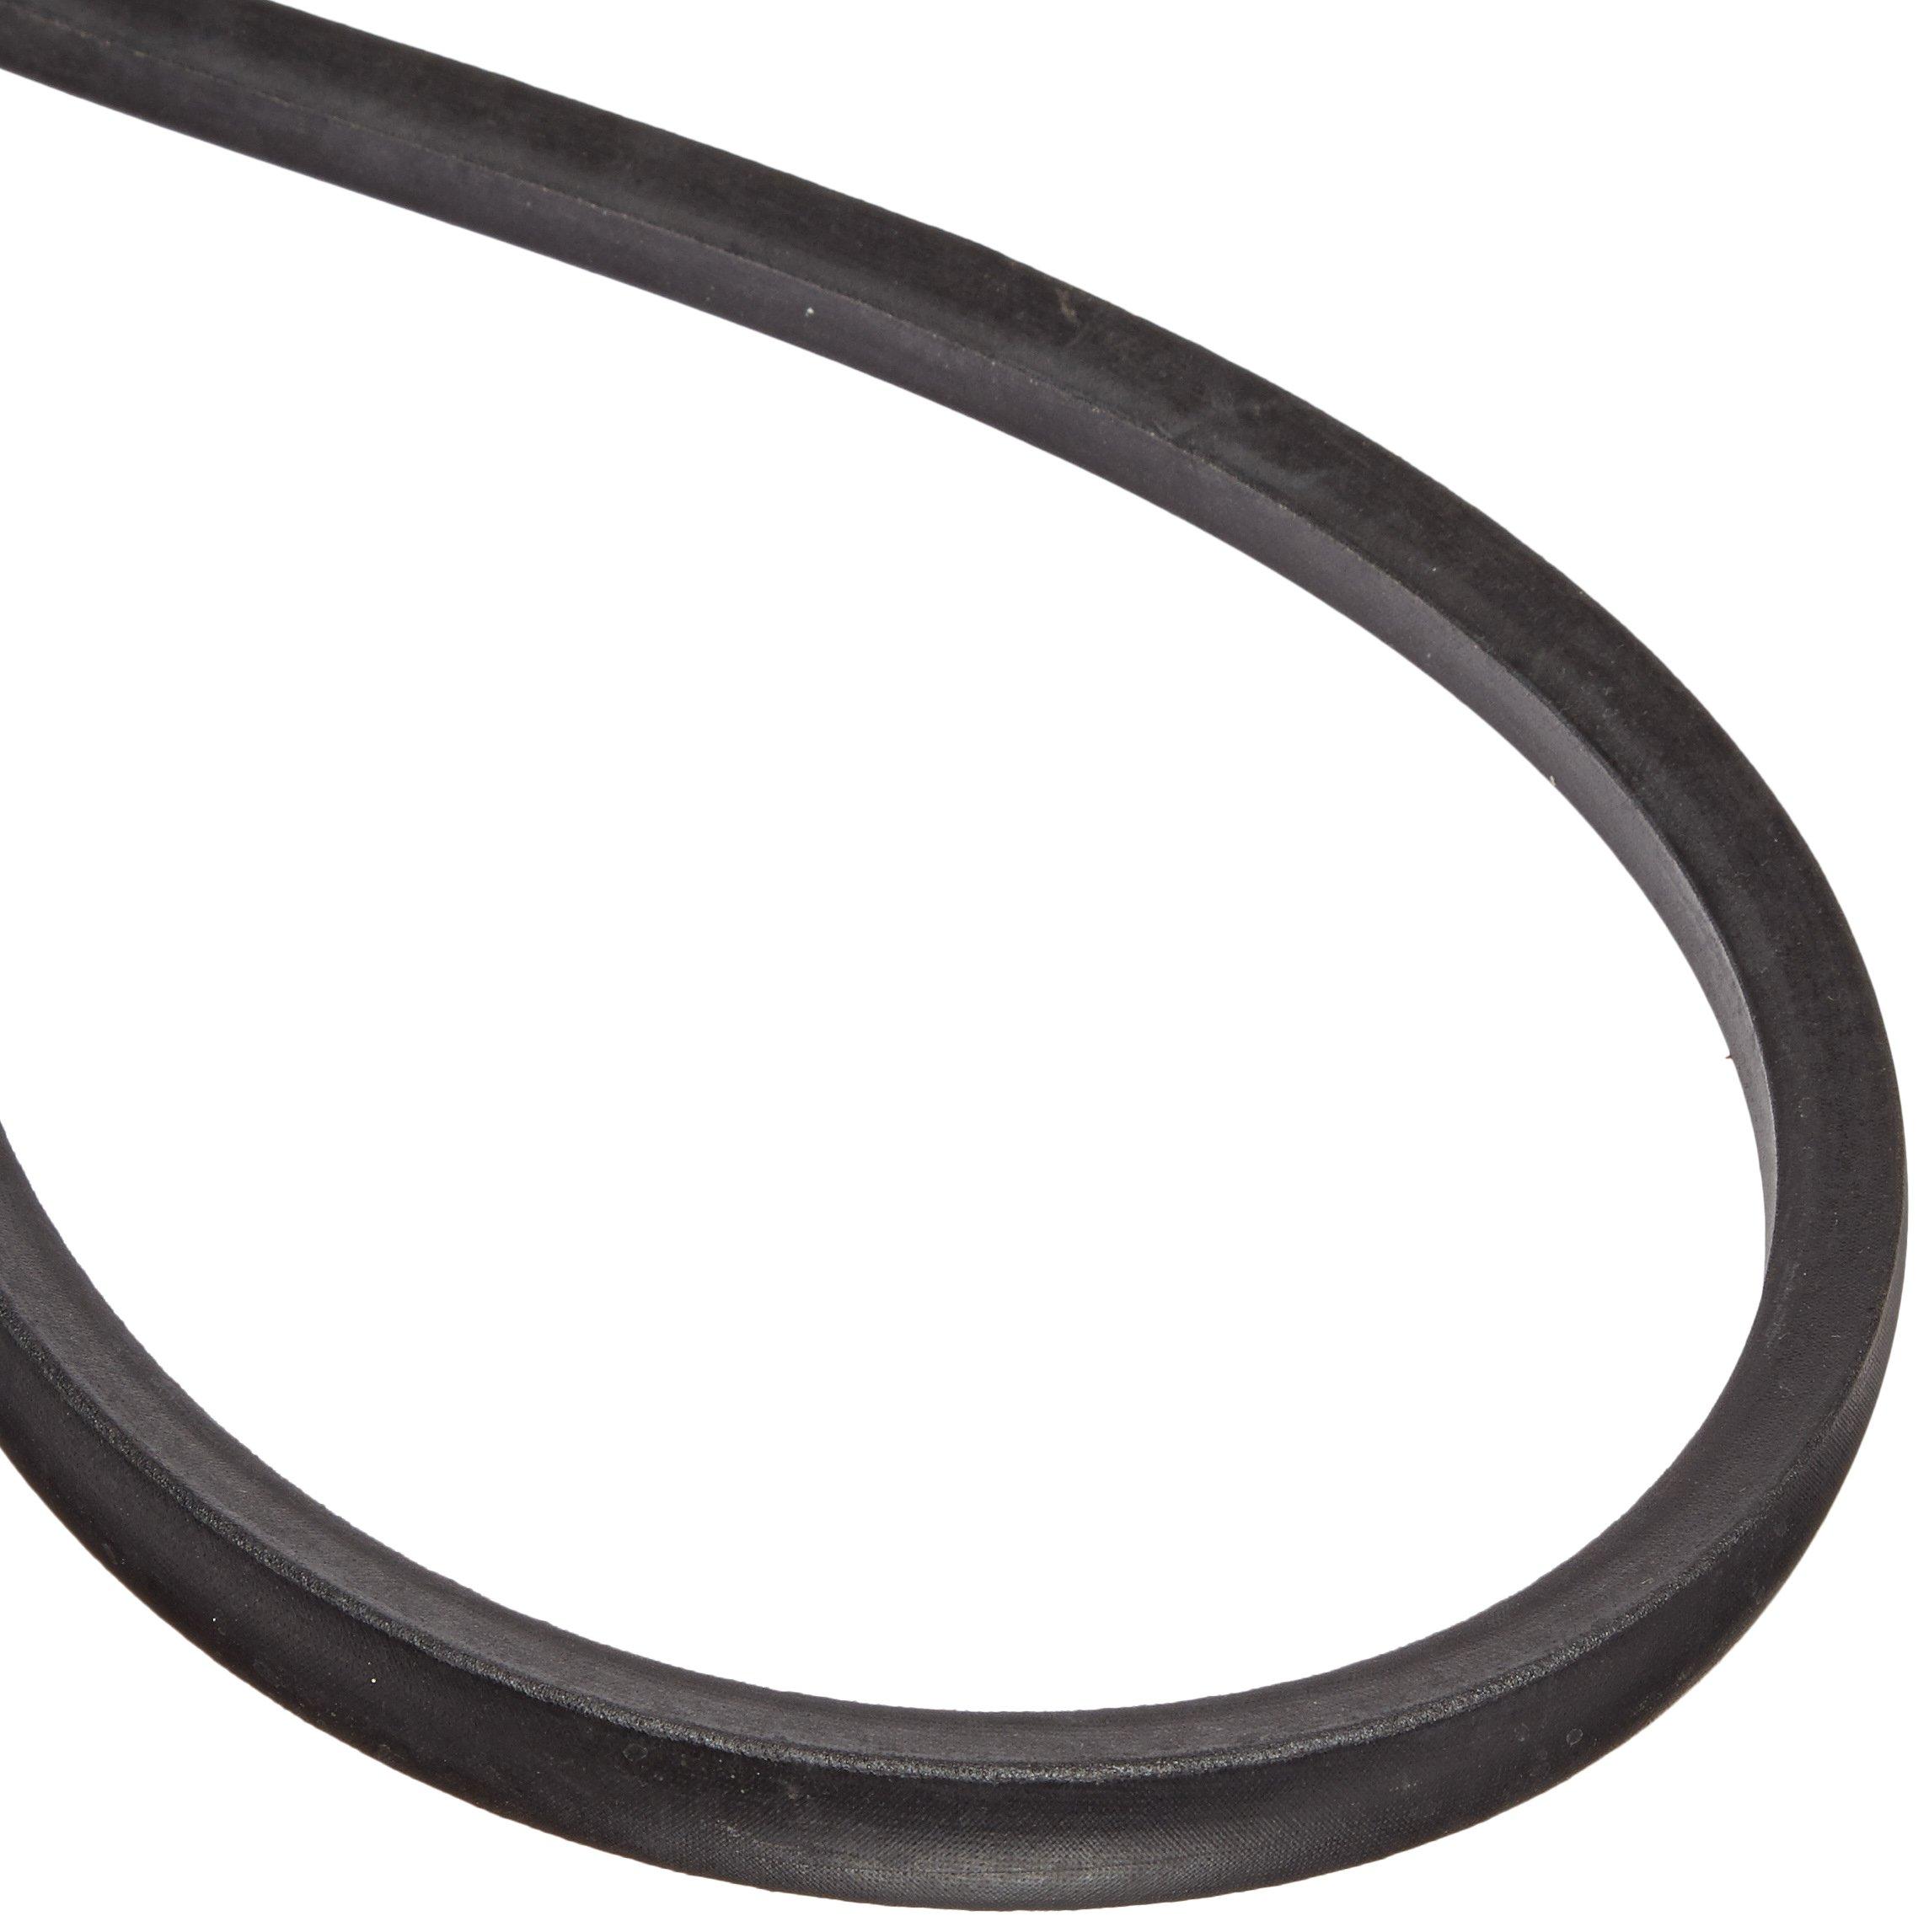 Gates C105 Hi-Power II Belt, C Section, C105 Size, 7/8'' Width, 17/32'' Height, 109.0'' Belt Outside Circumference